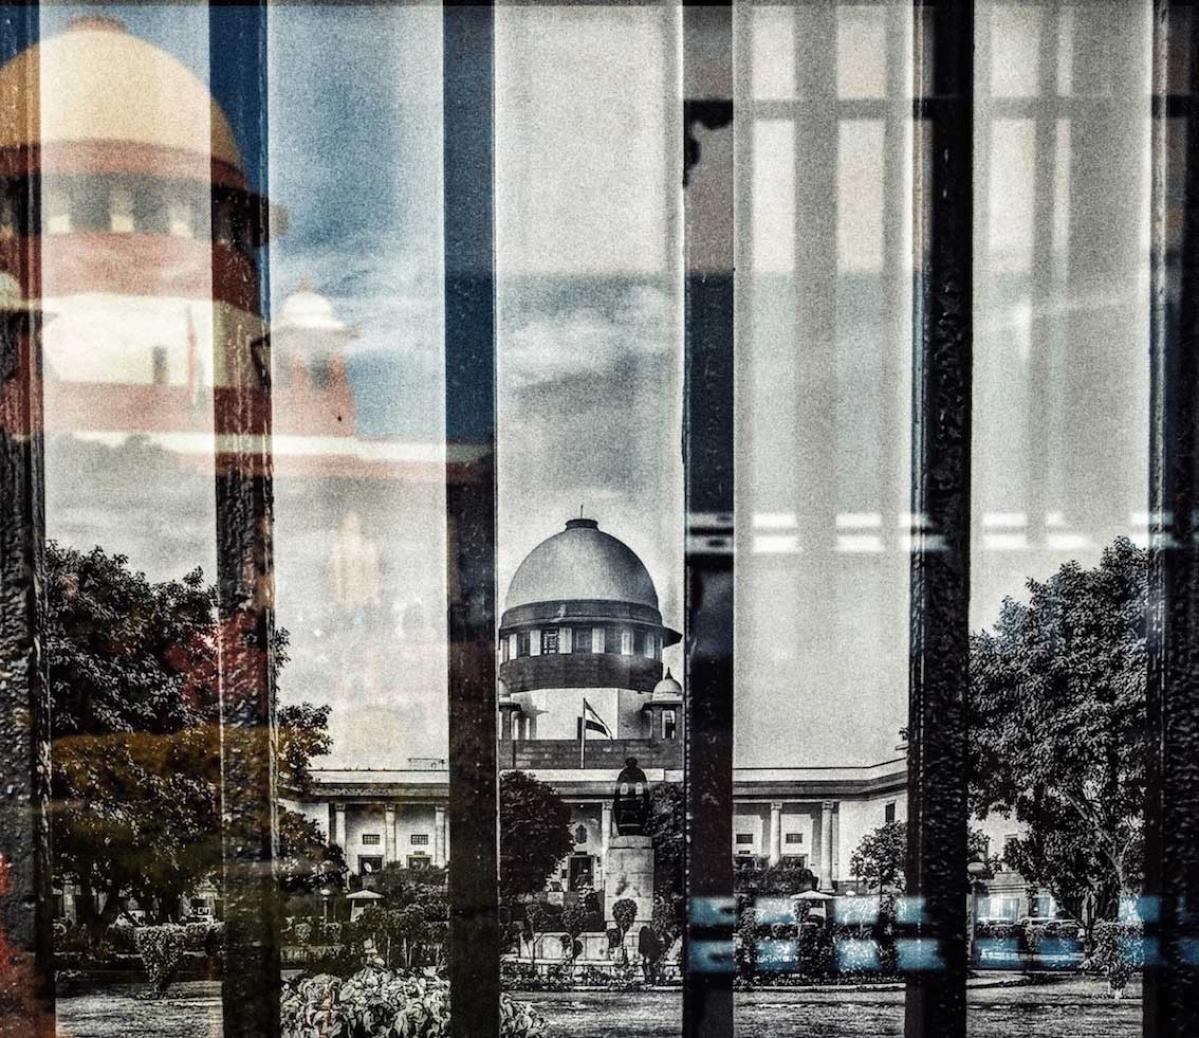 Anticipatory Bail versus Custodial Interrogation: Striking a balance